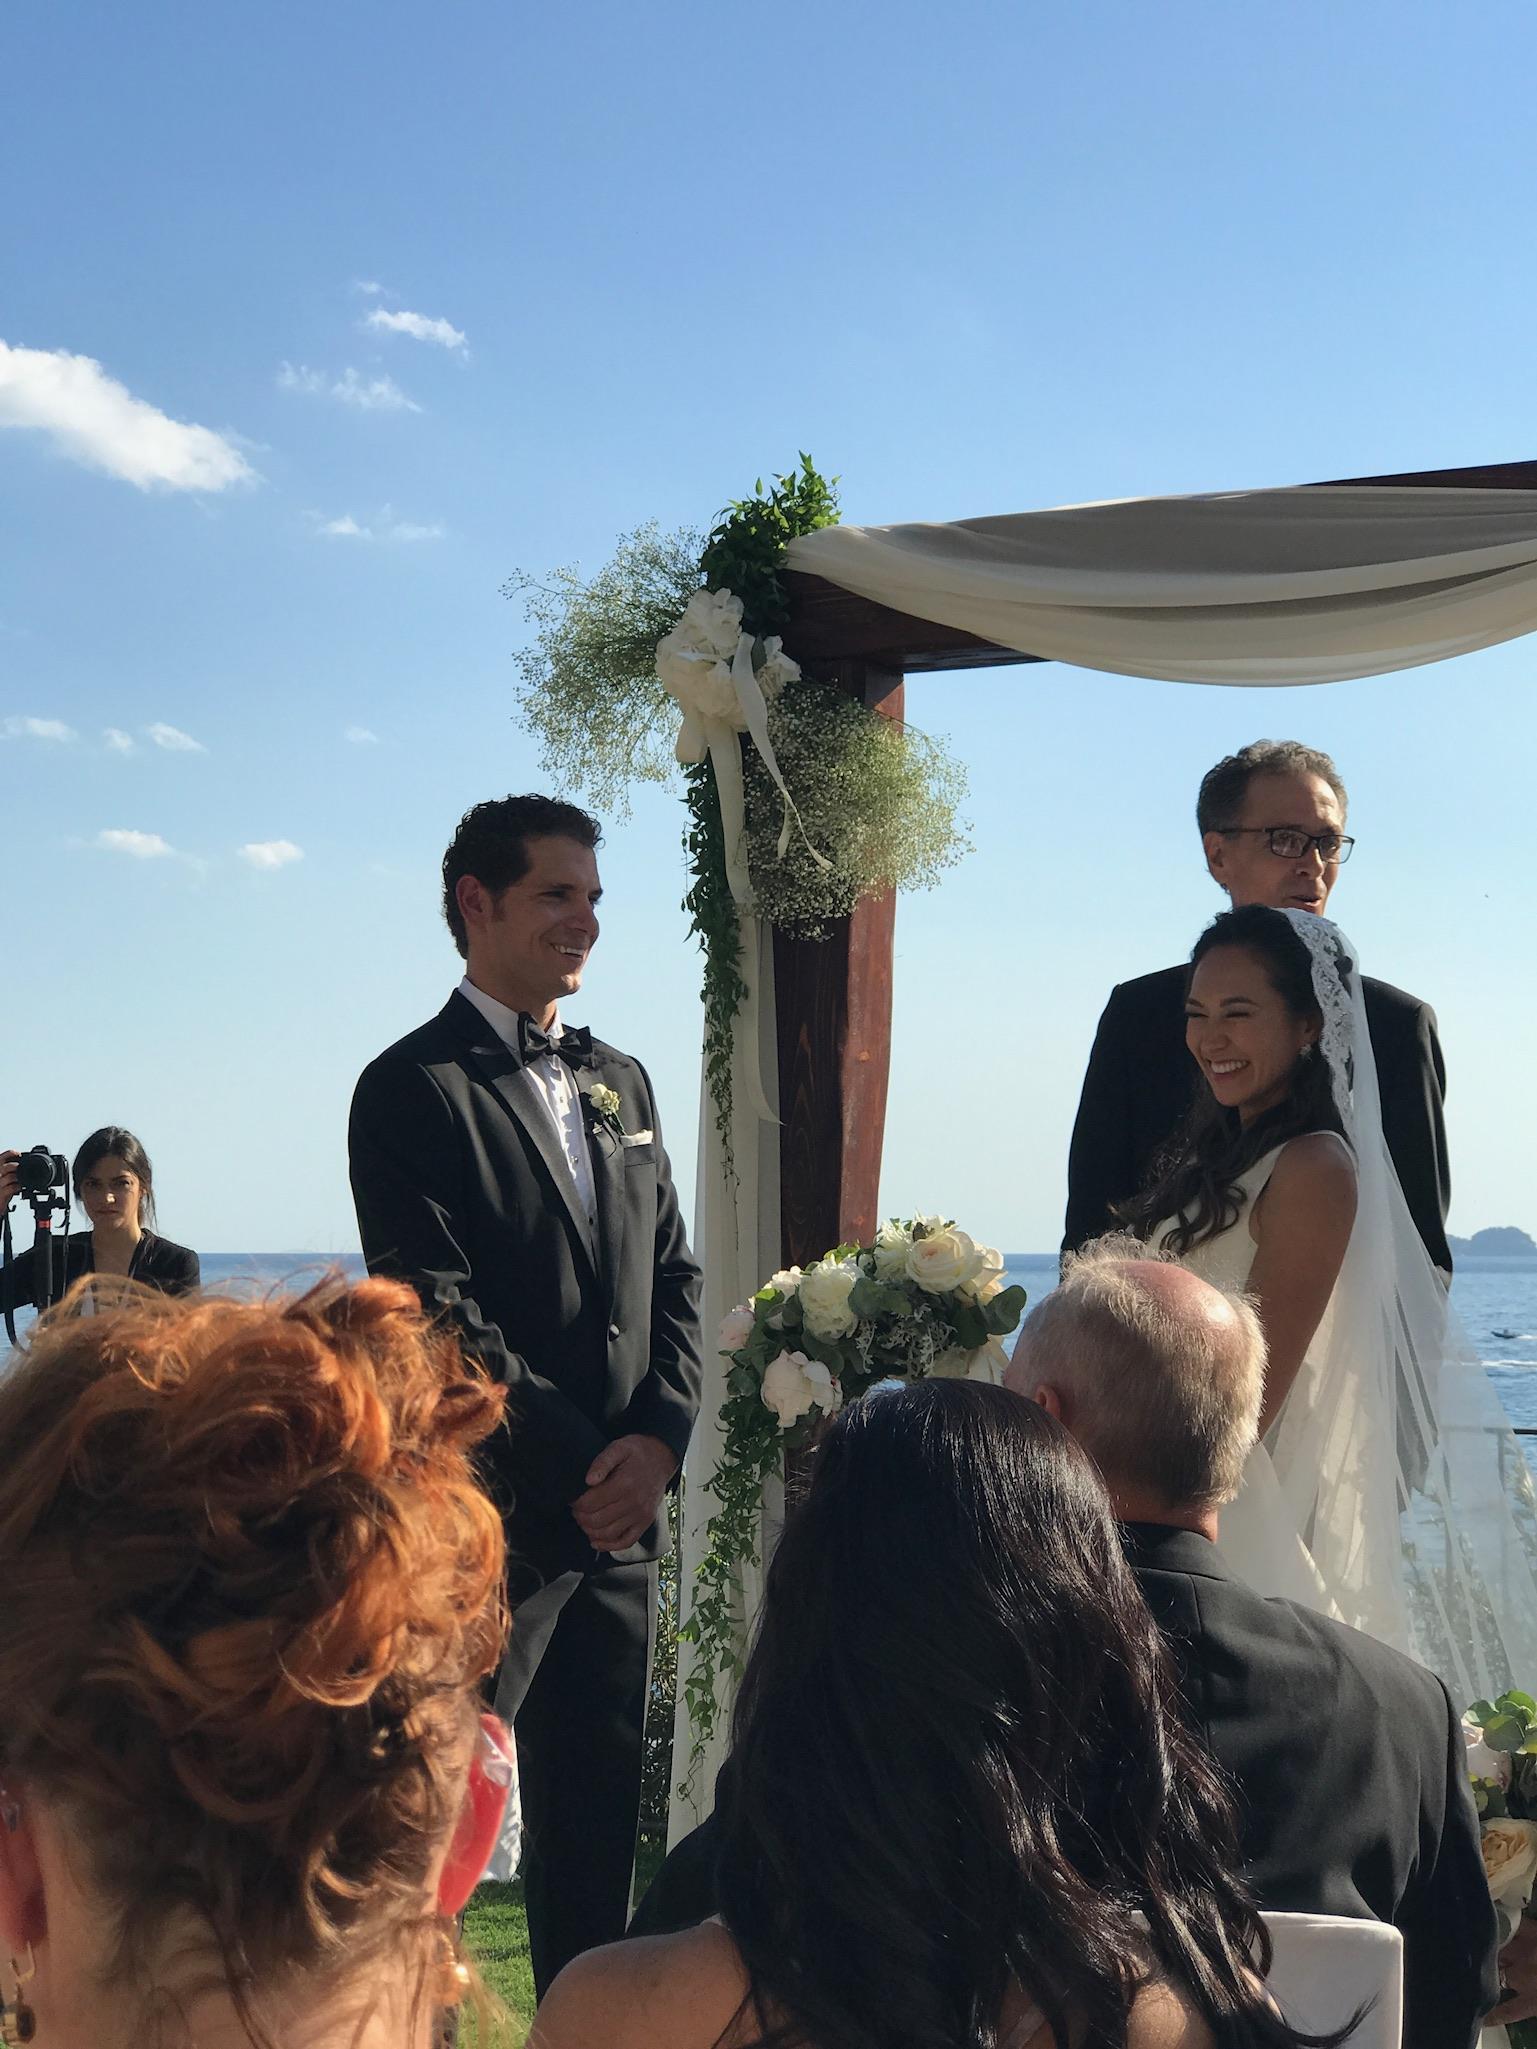 https://www.weddingamalfi.com/wp-content/uploads/Nathalie-and-Benjamin-wedding-in-Positano-3.jpg